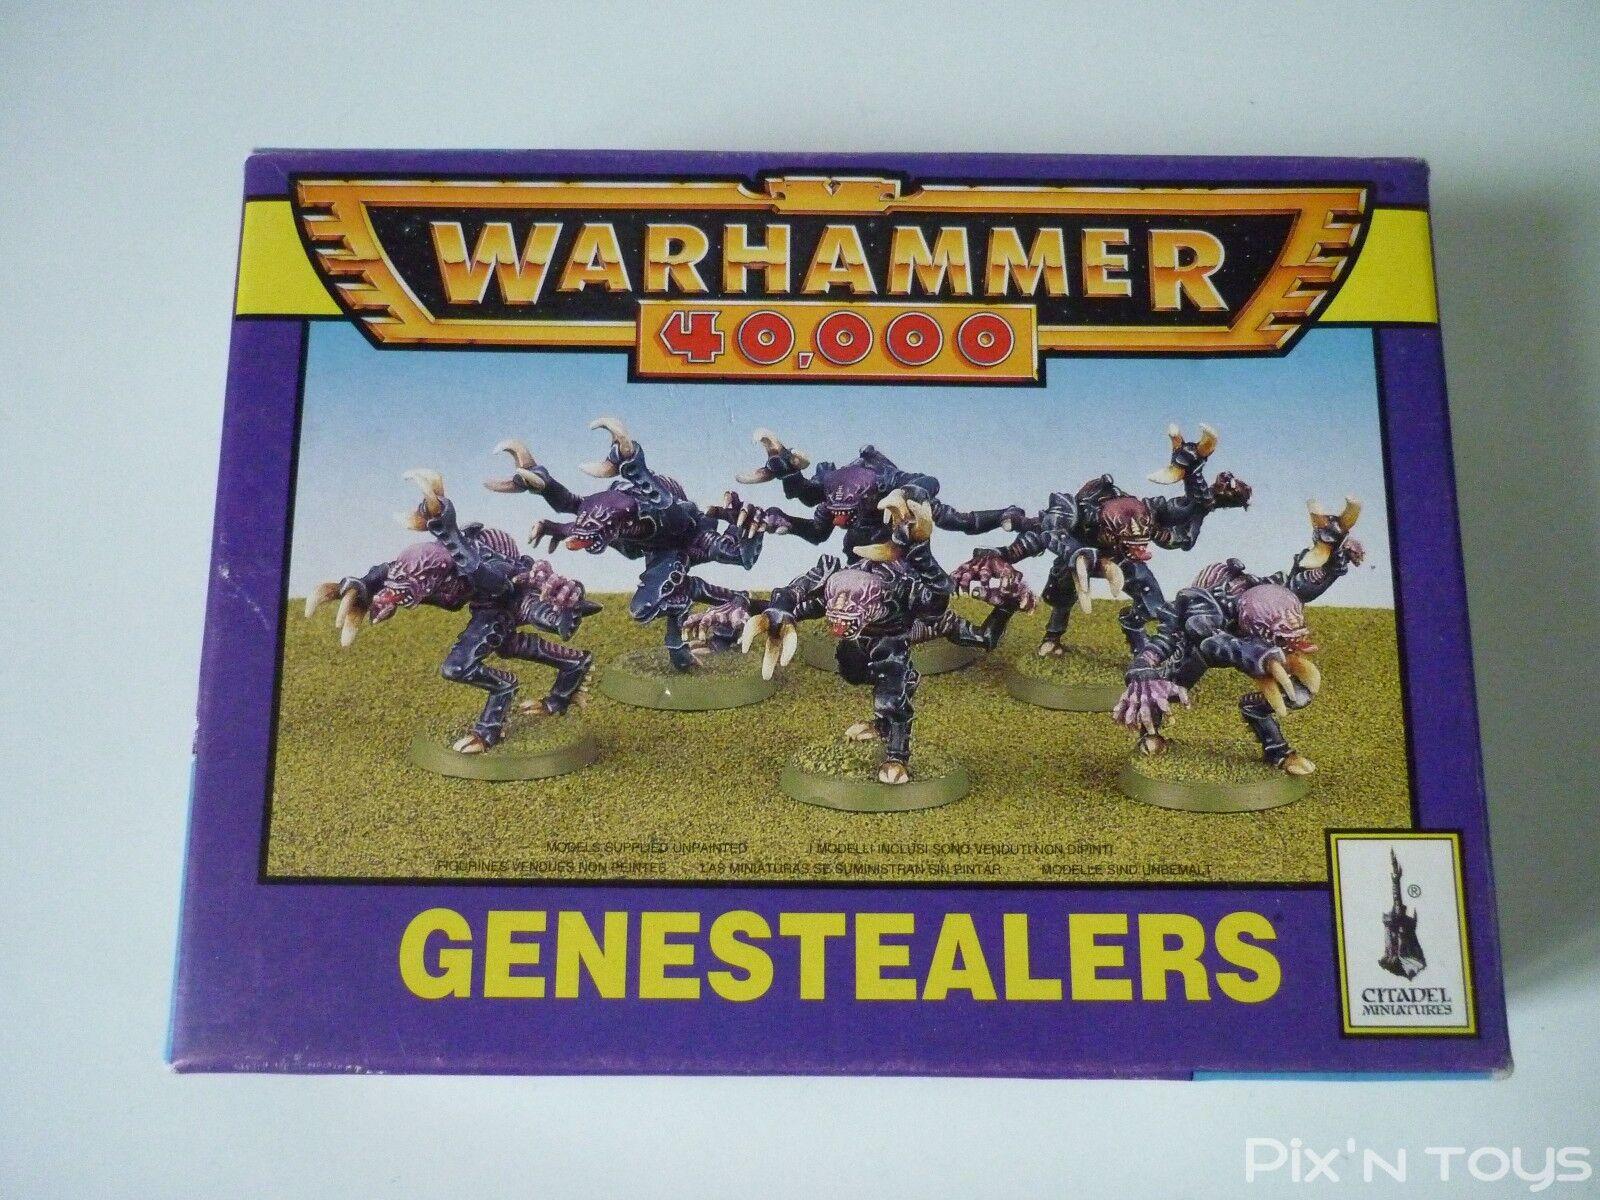 Warhammer 40.000 figur 40k boite de 6 genestealers   zitadelle, 1996